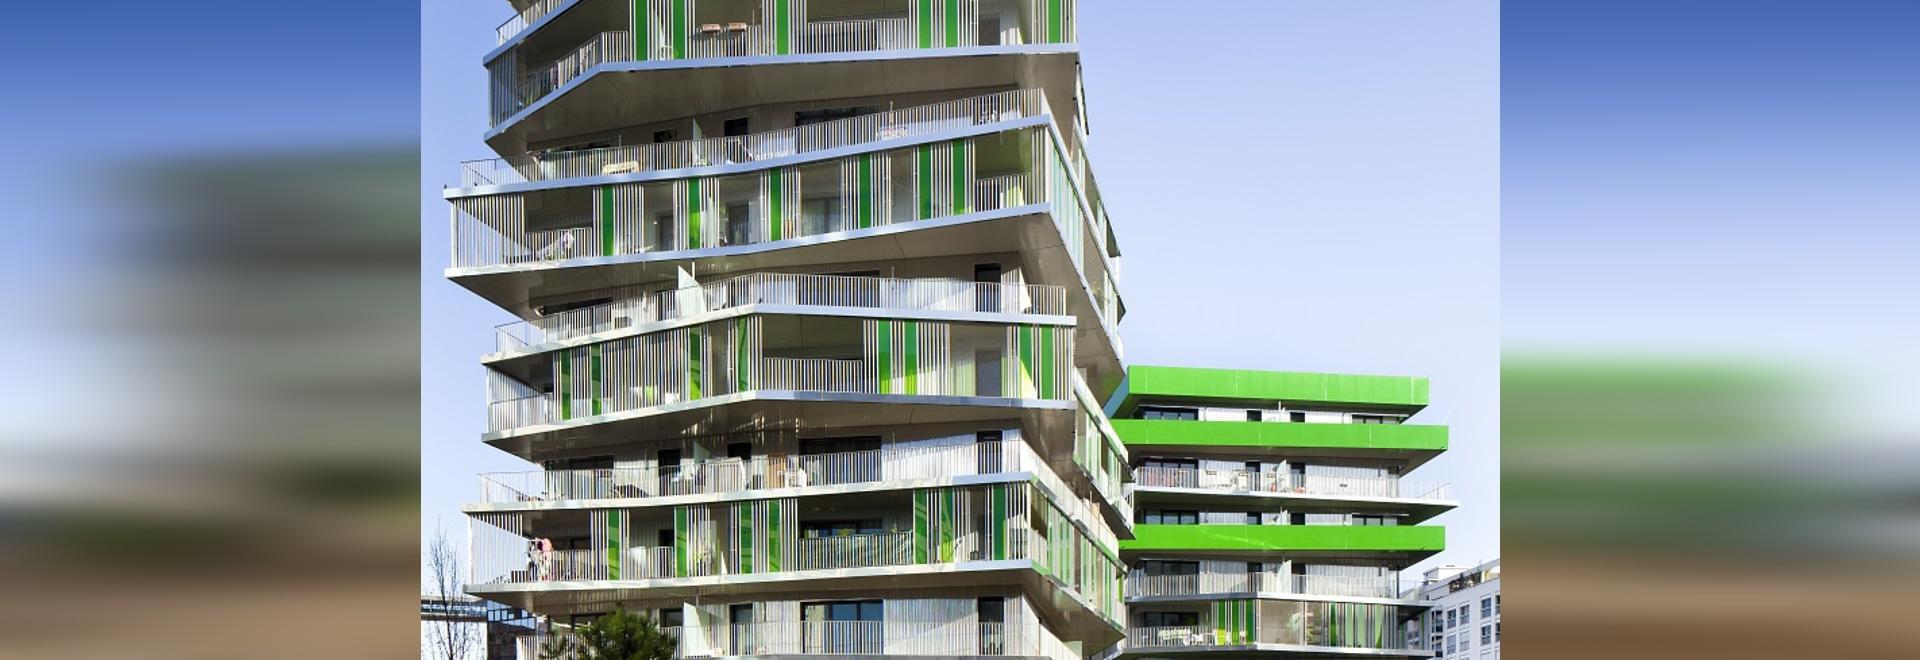 62 alloggi sociali  a Parigi